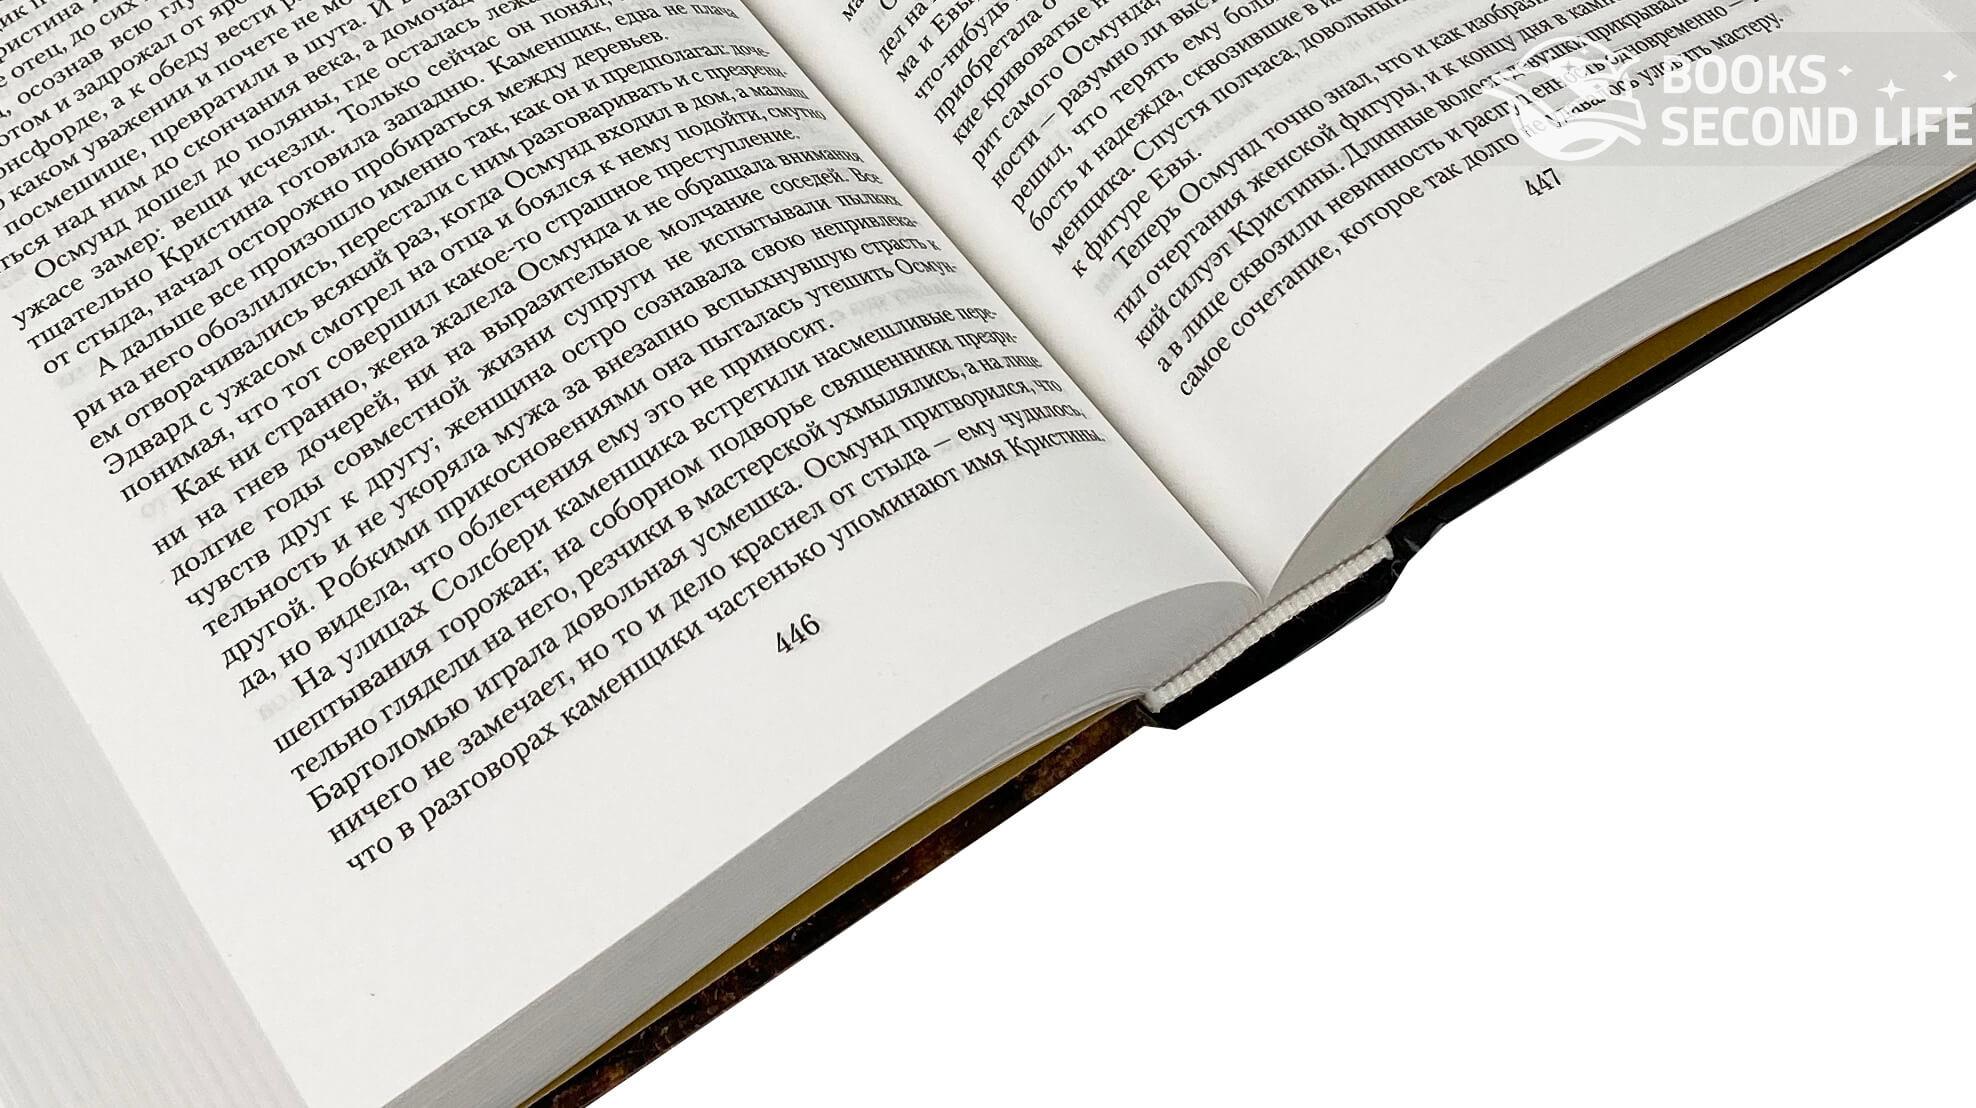 Сарум. Роман об Англии. Автор — Эдвард Резерфорд. Переплет —